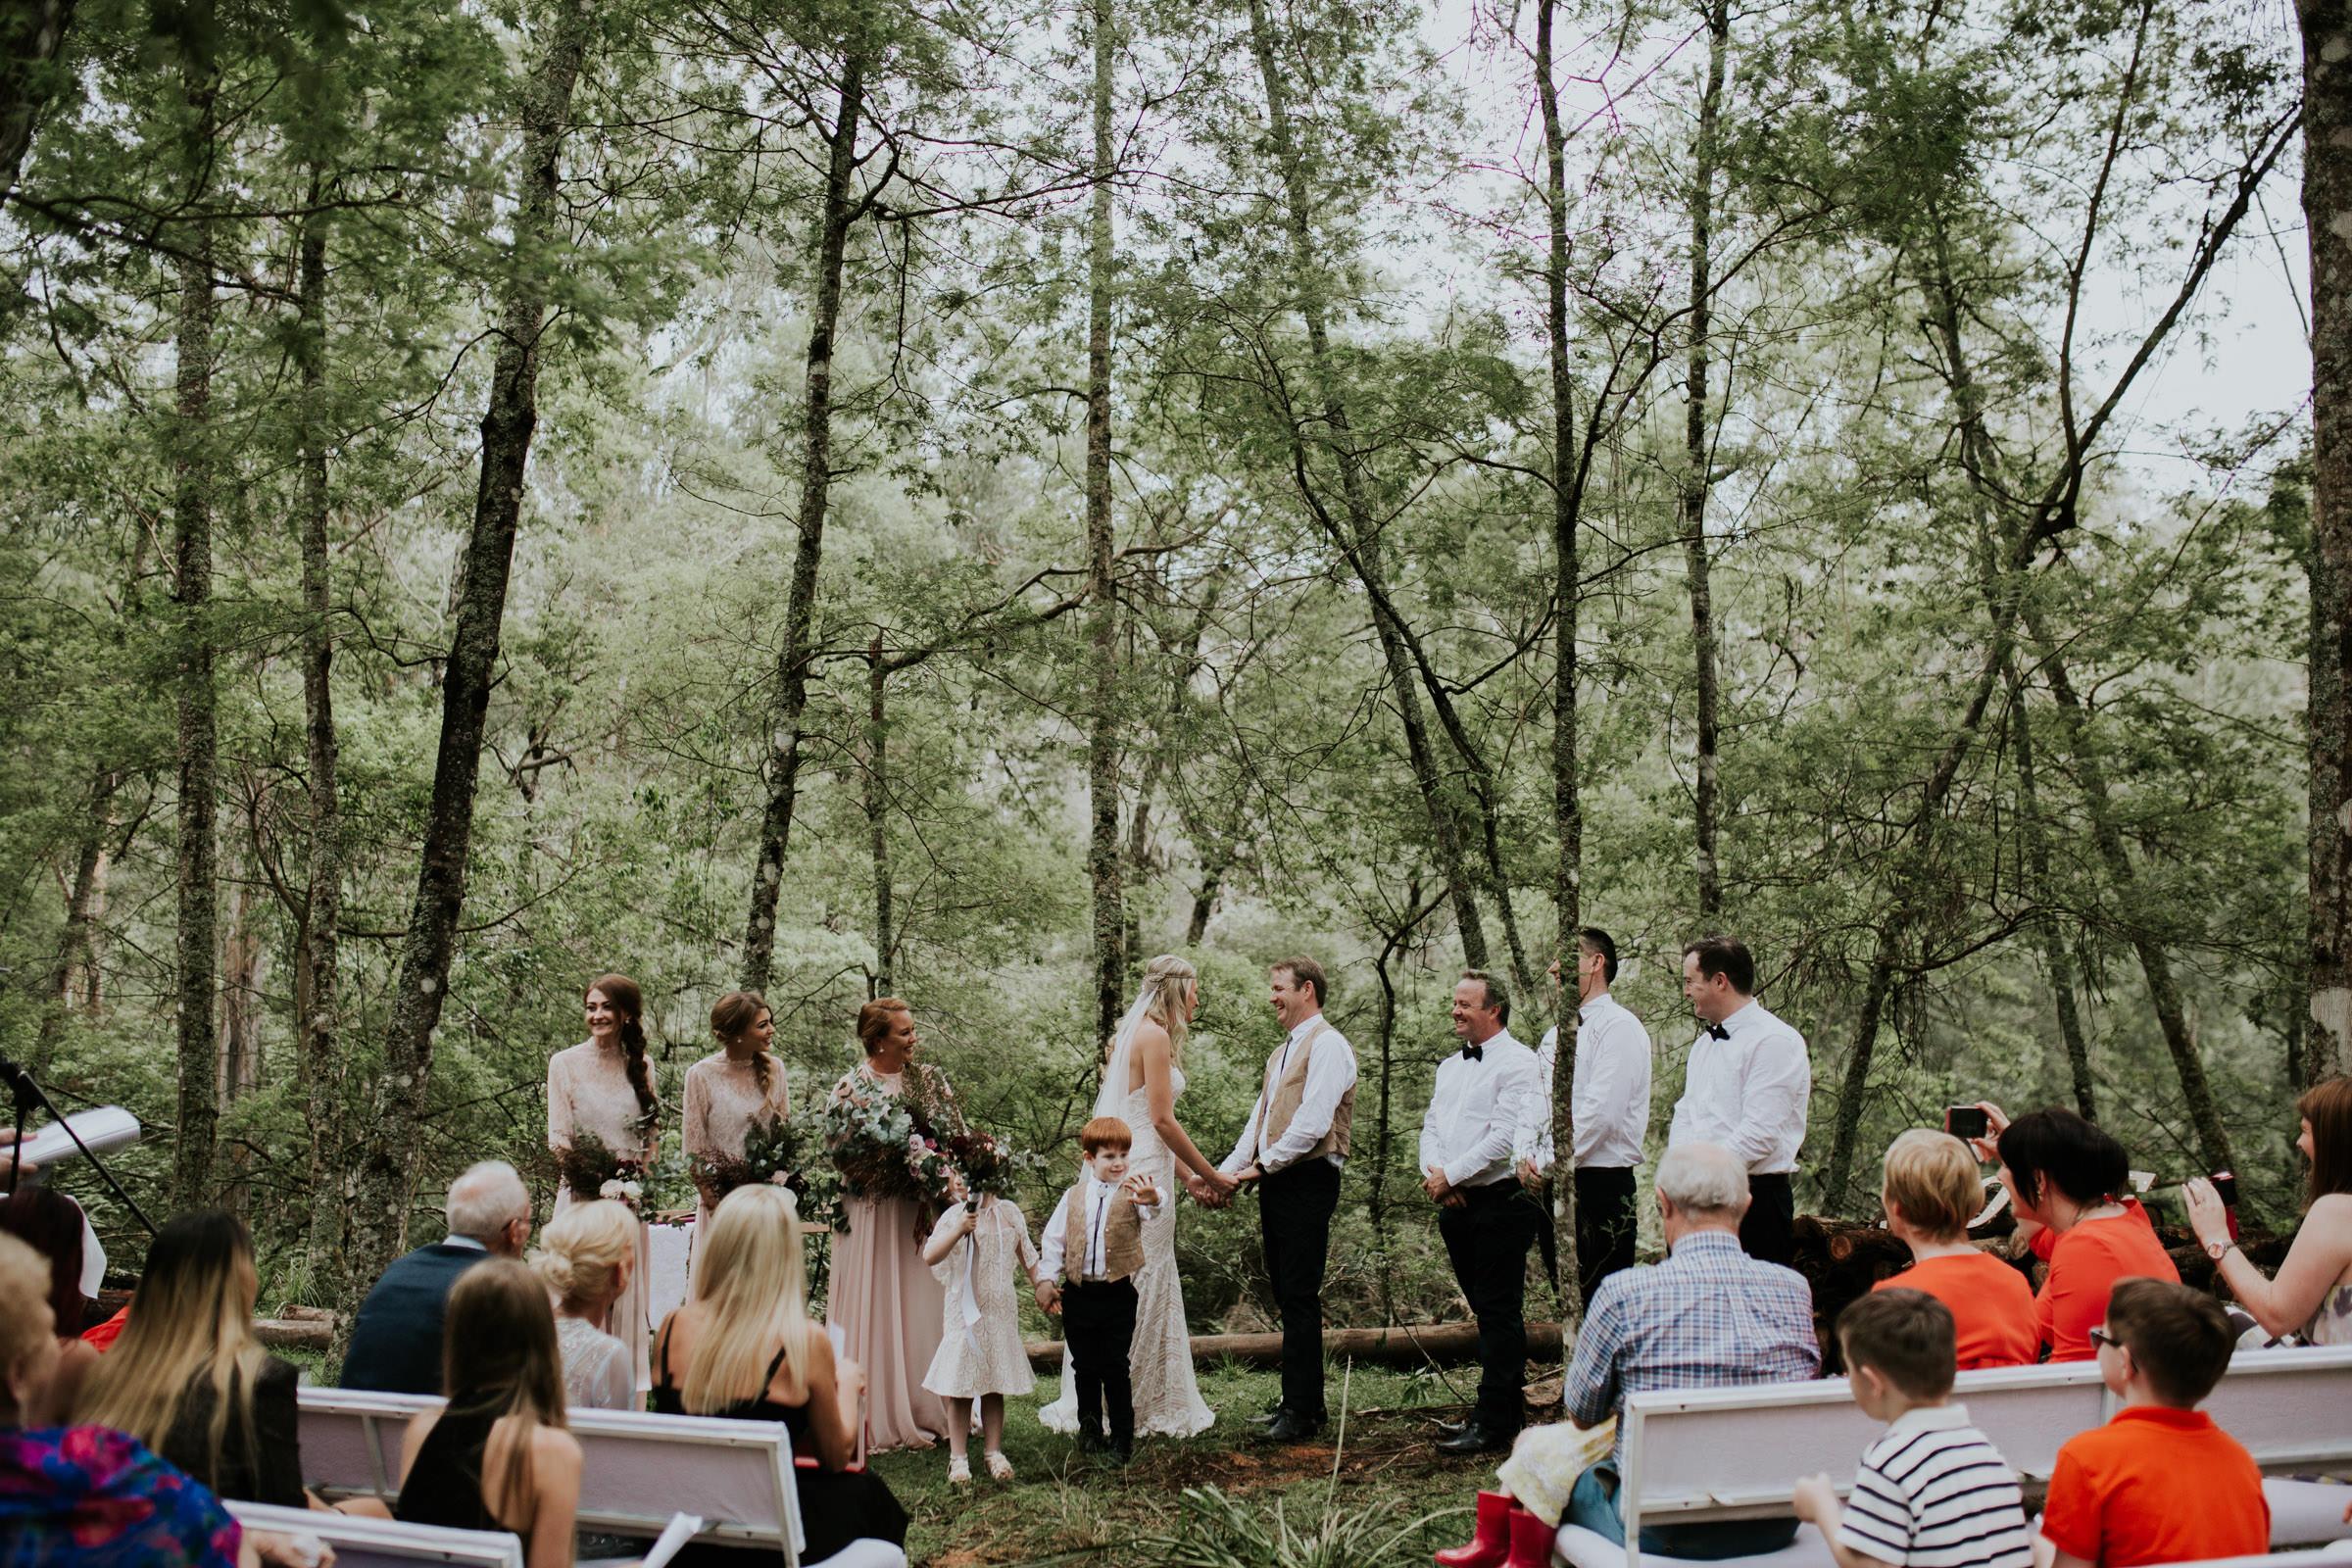 Emma+John+Far+South+Coast+Wedding+Festivl+Glamping+Bush-106.jpg